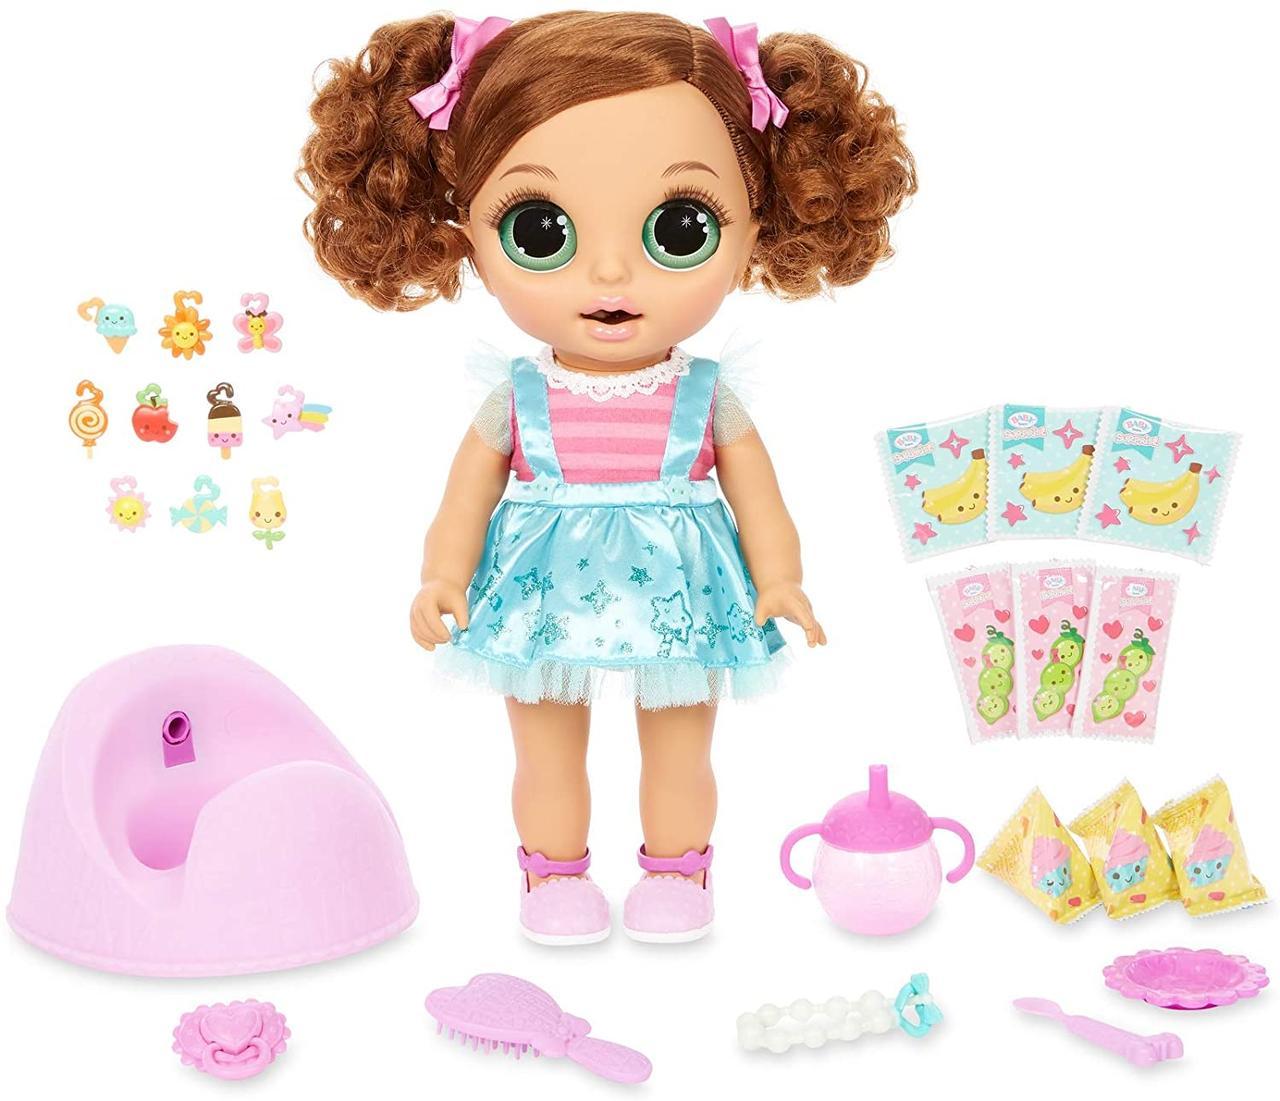 Кукла  Беби Борн Шатенка Принцесса и волшебный горшок 30 сюрпризов Baby Born Surprise Magic Potty Surprise